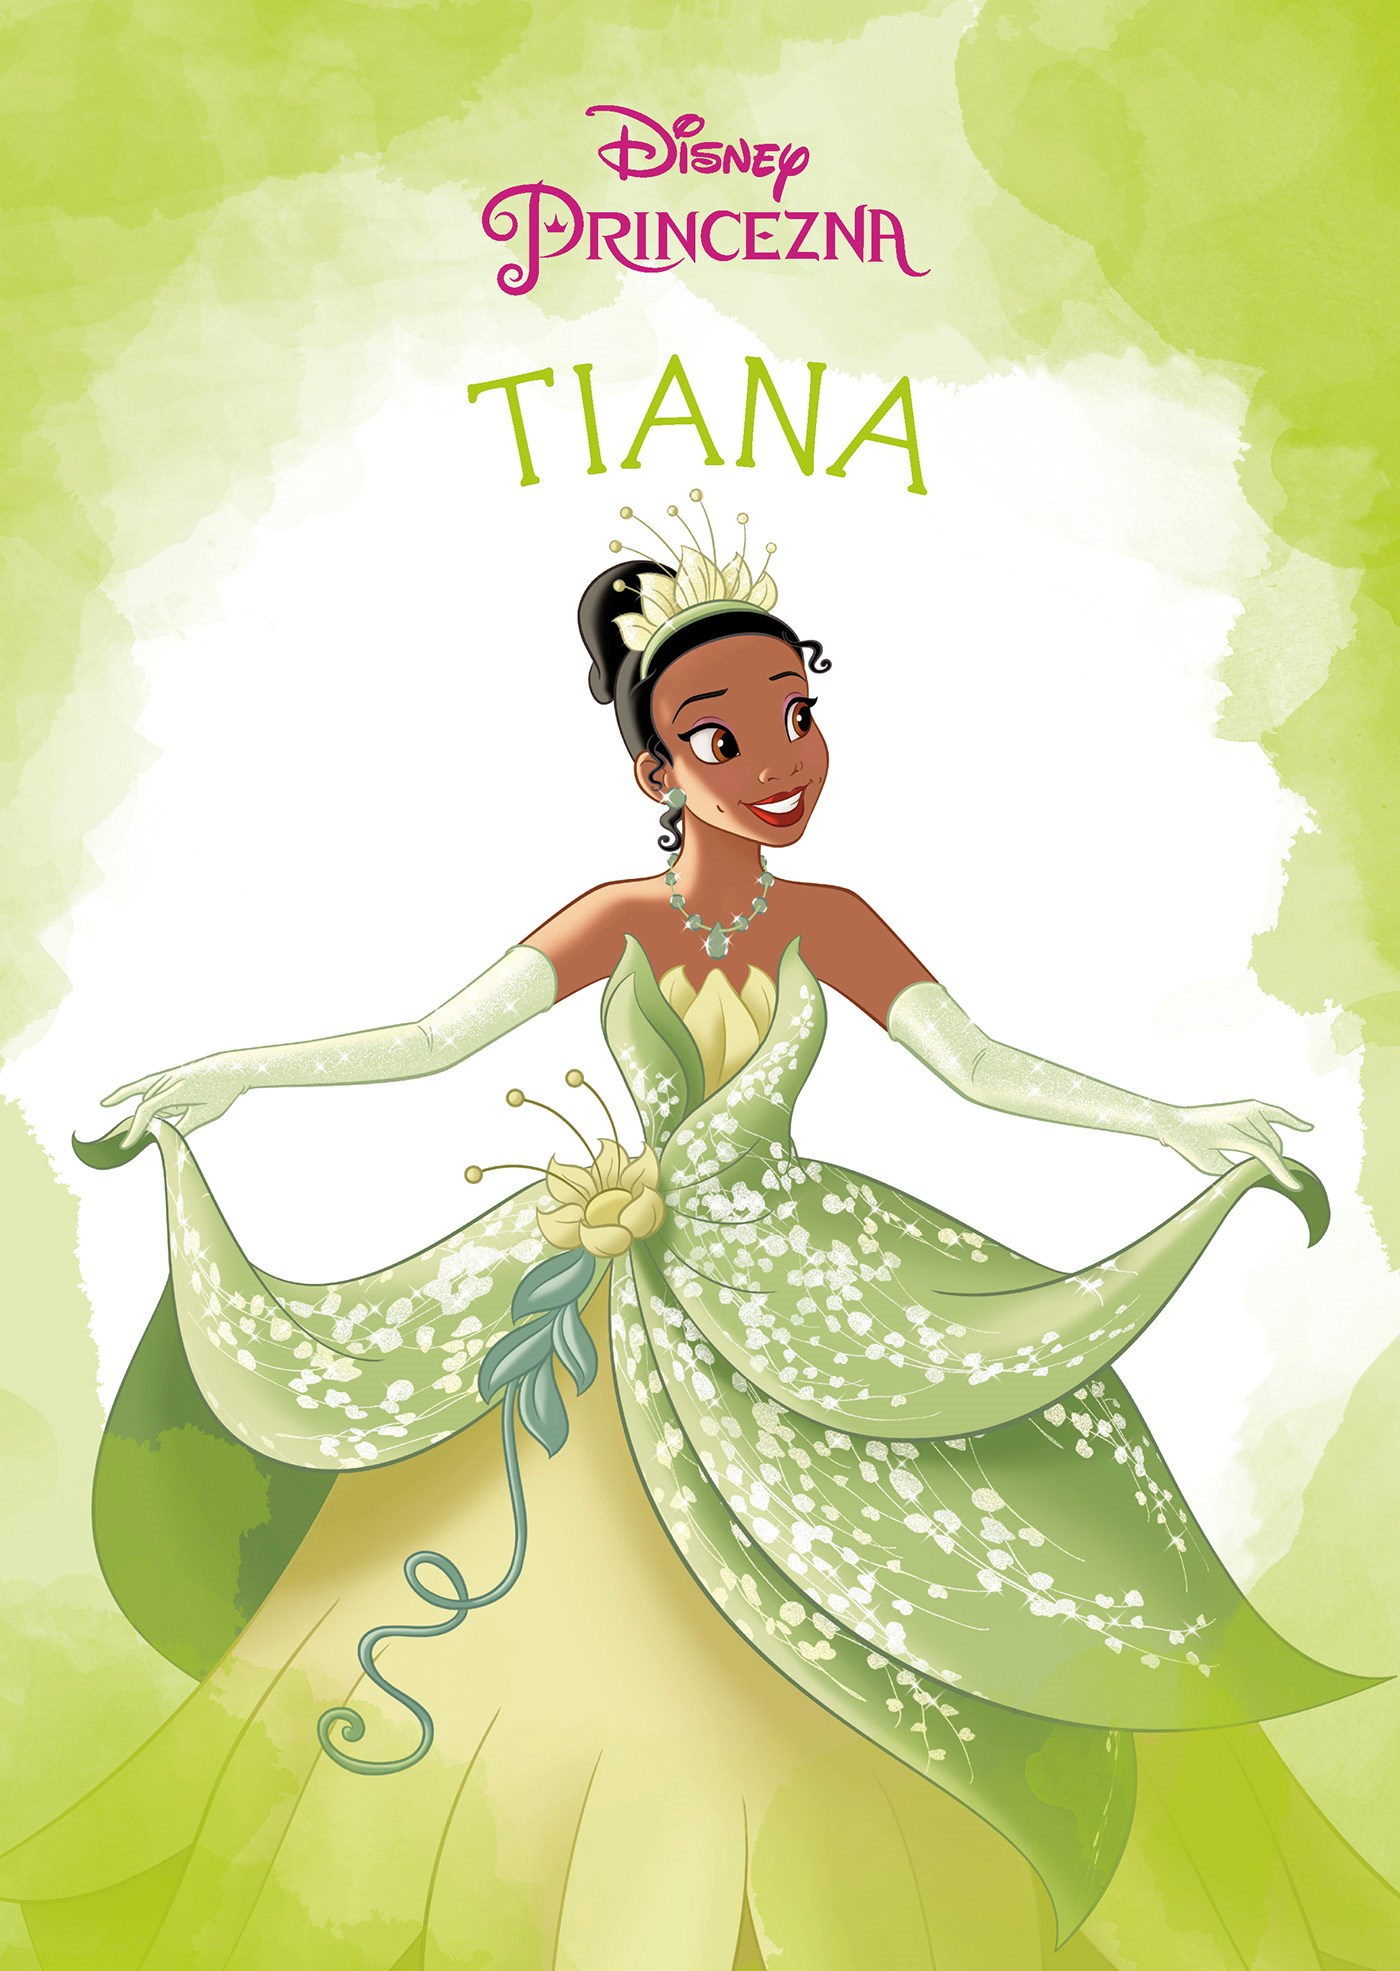 Princezna - Tiana